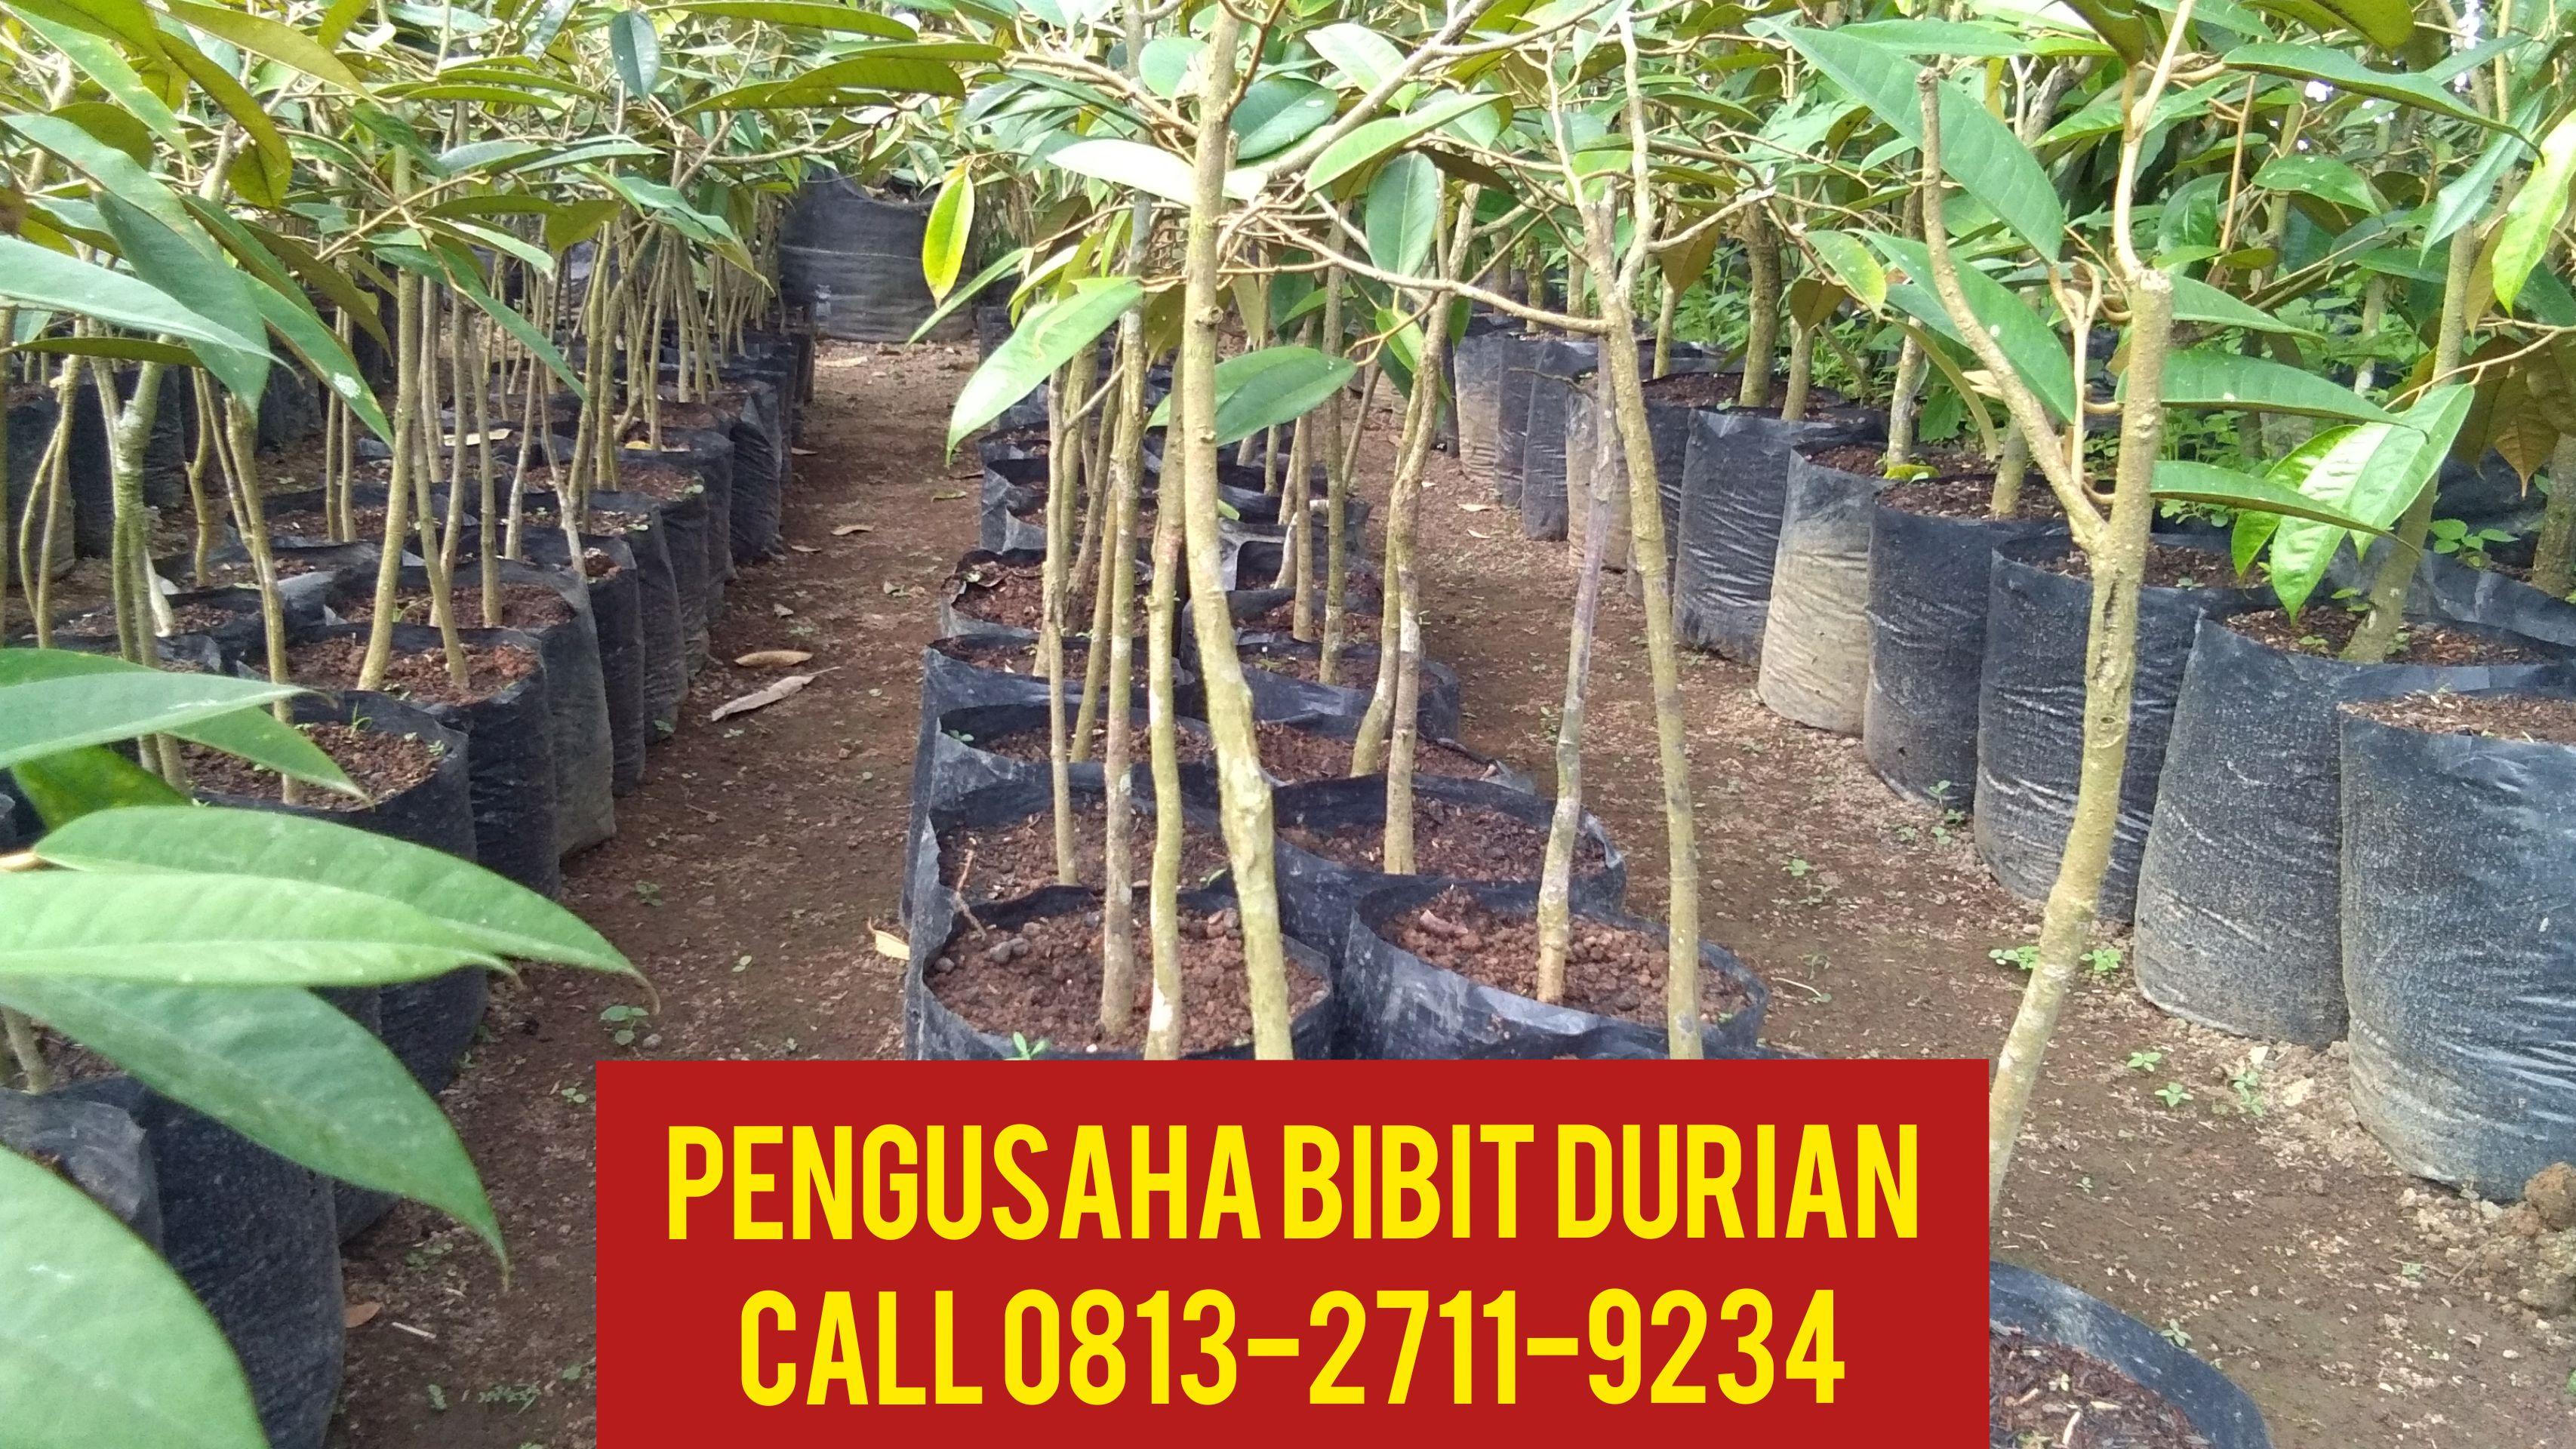 Kebun Durian Montong Karanganyar